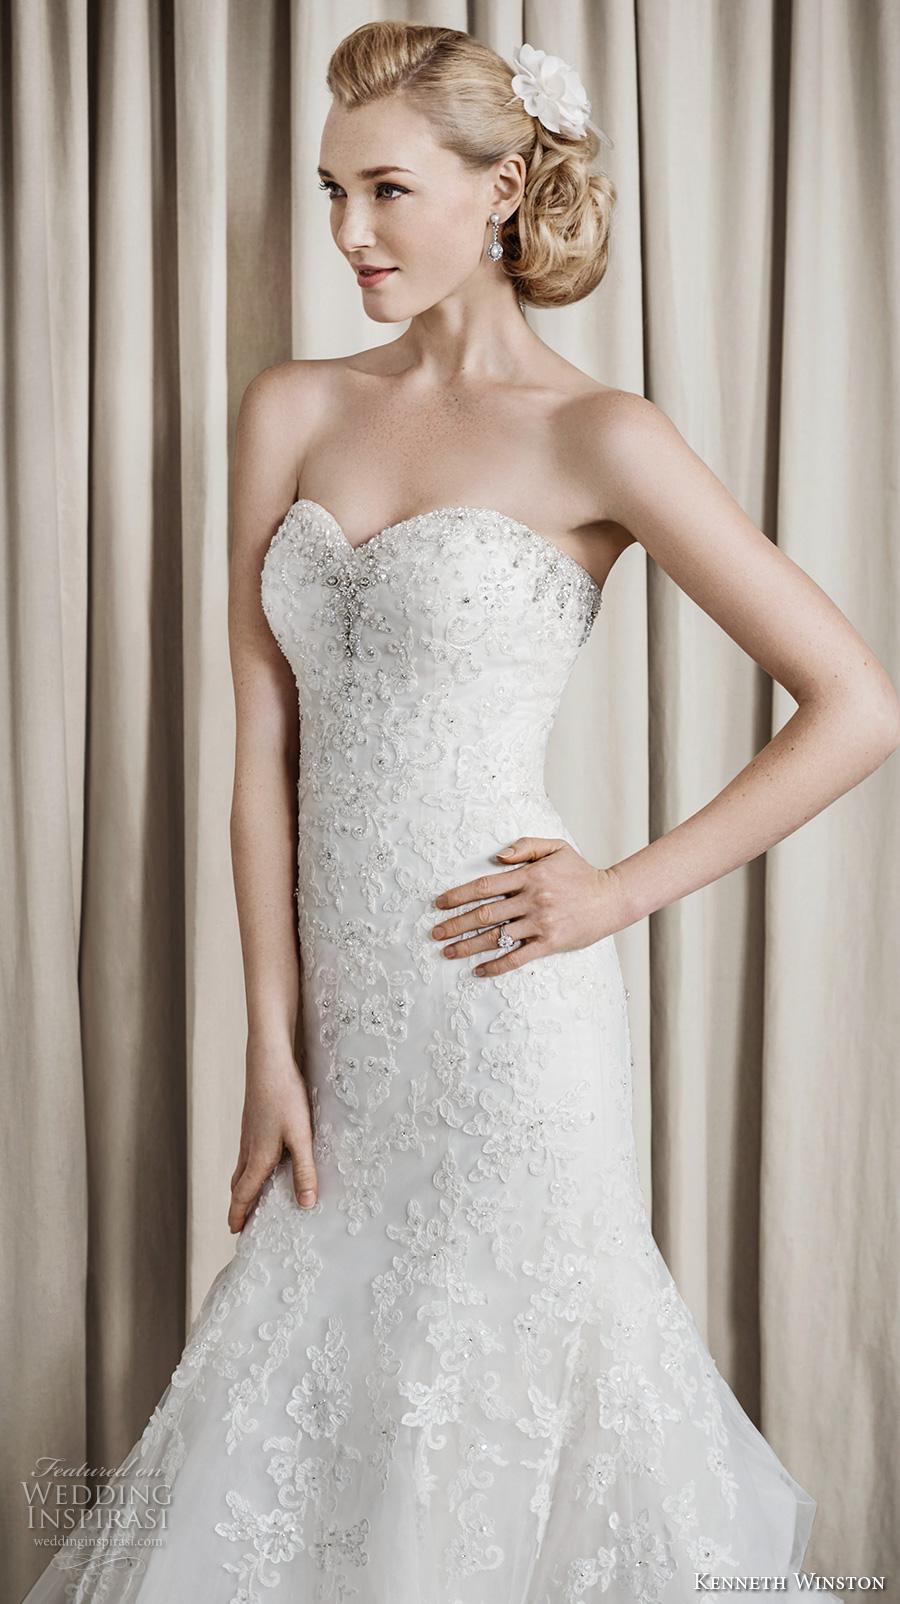 Kenneth Winston Fall 20 Wedding Dresses   Wedding Inspirasi